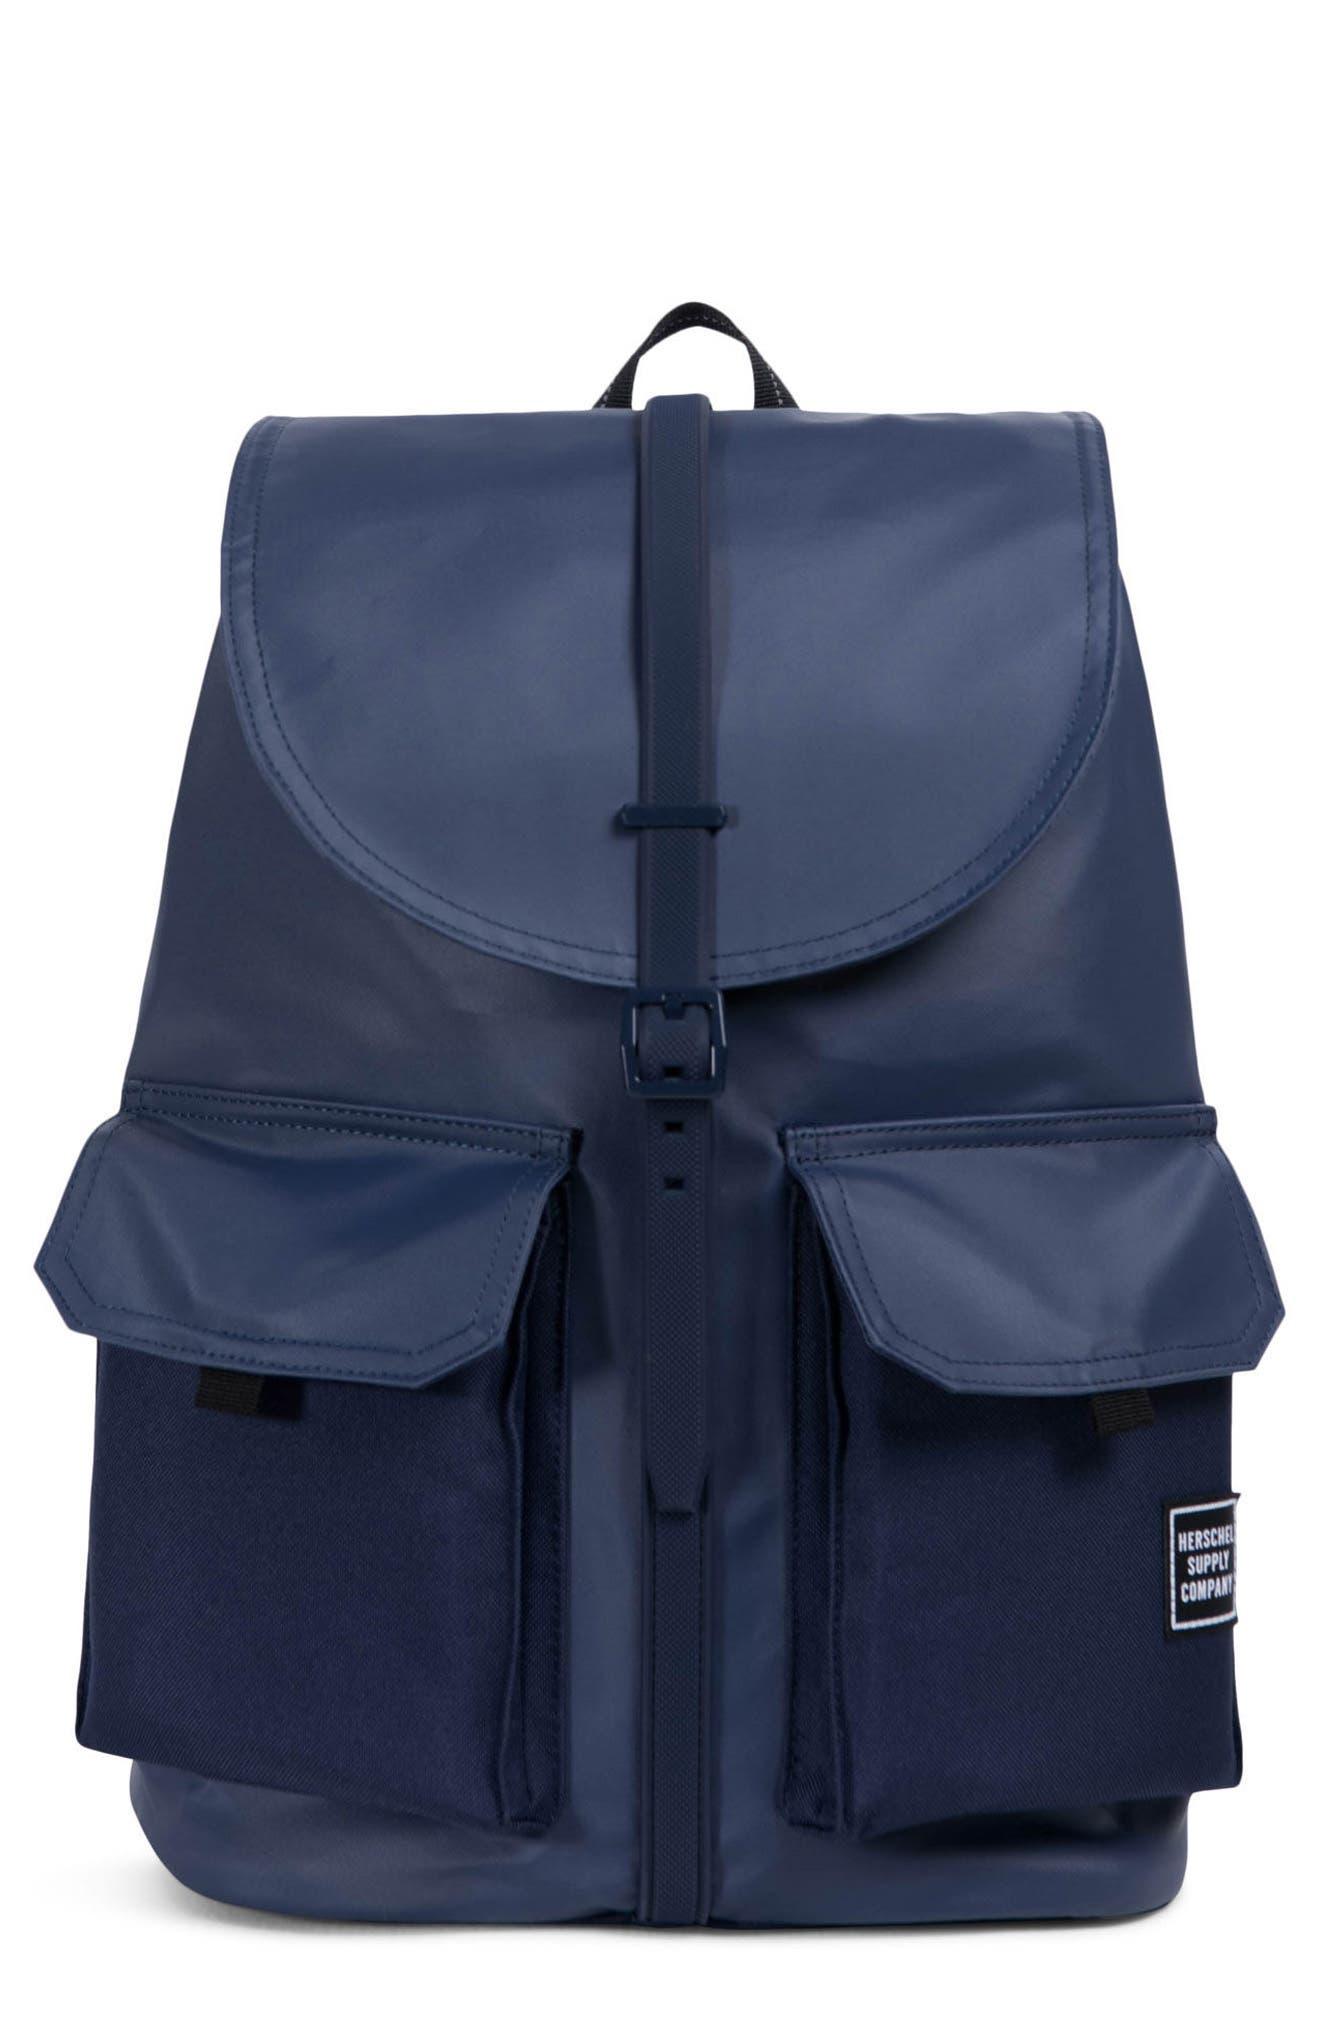 Herschel Supply Co. Dawson Studio Collection Backpack